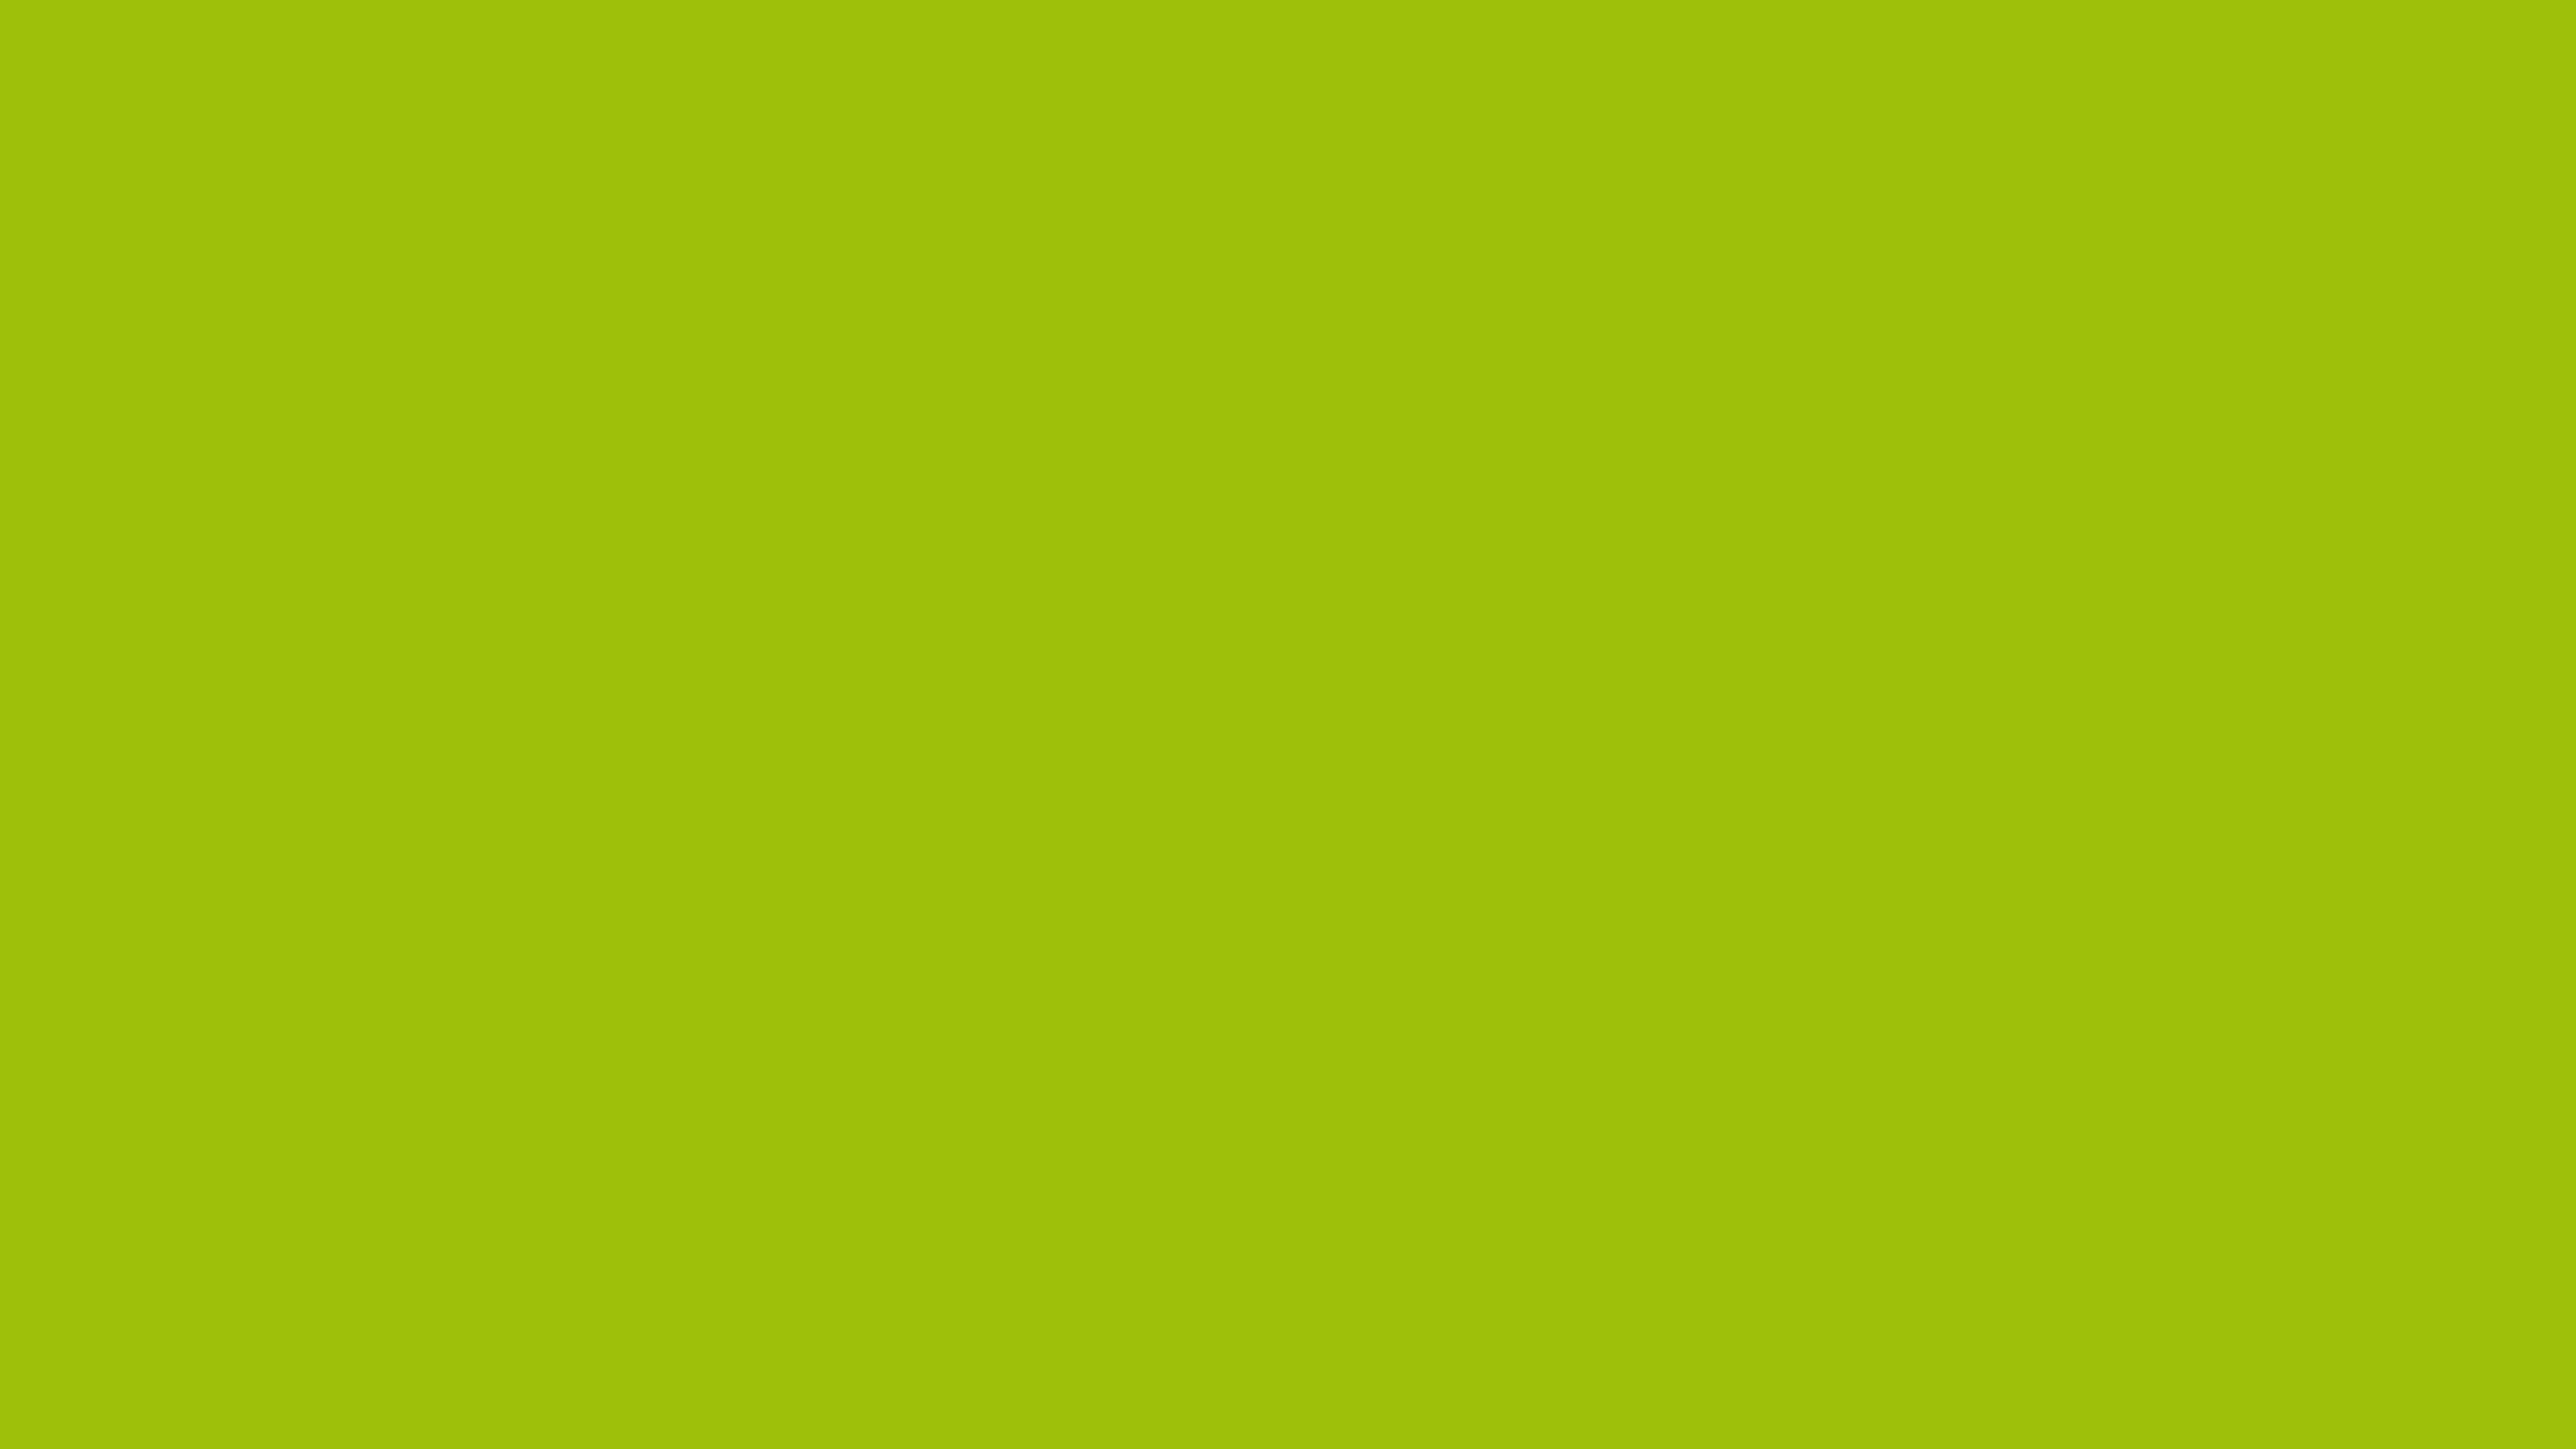 3840x2160 Limerick Solid Color Background